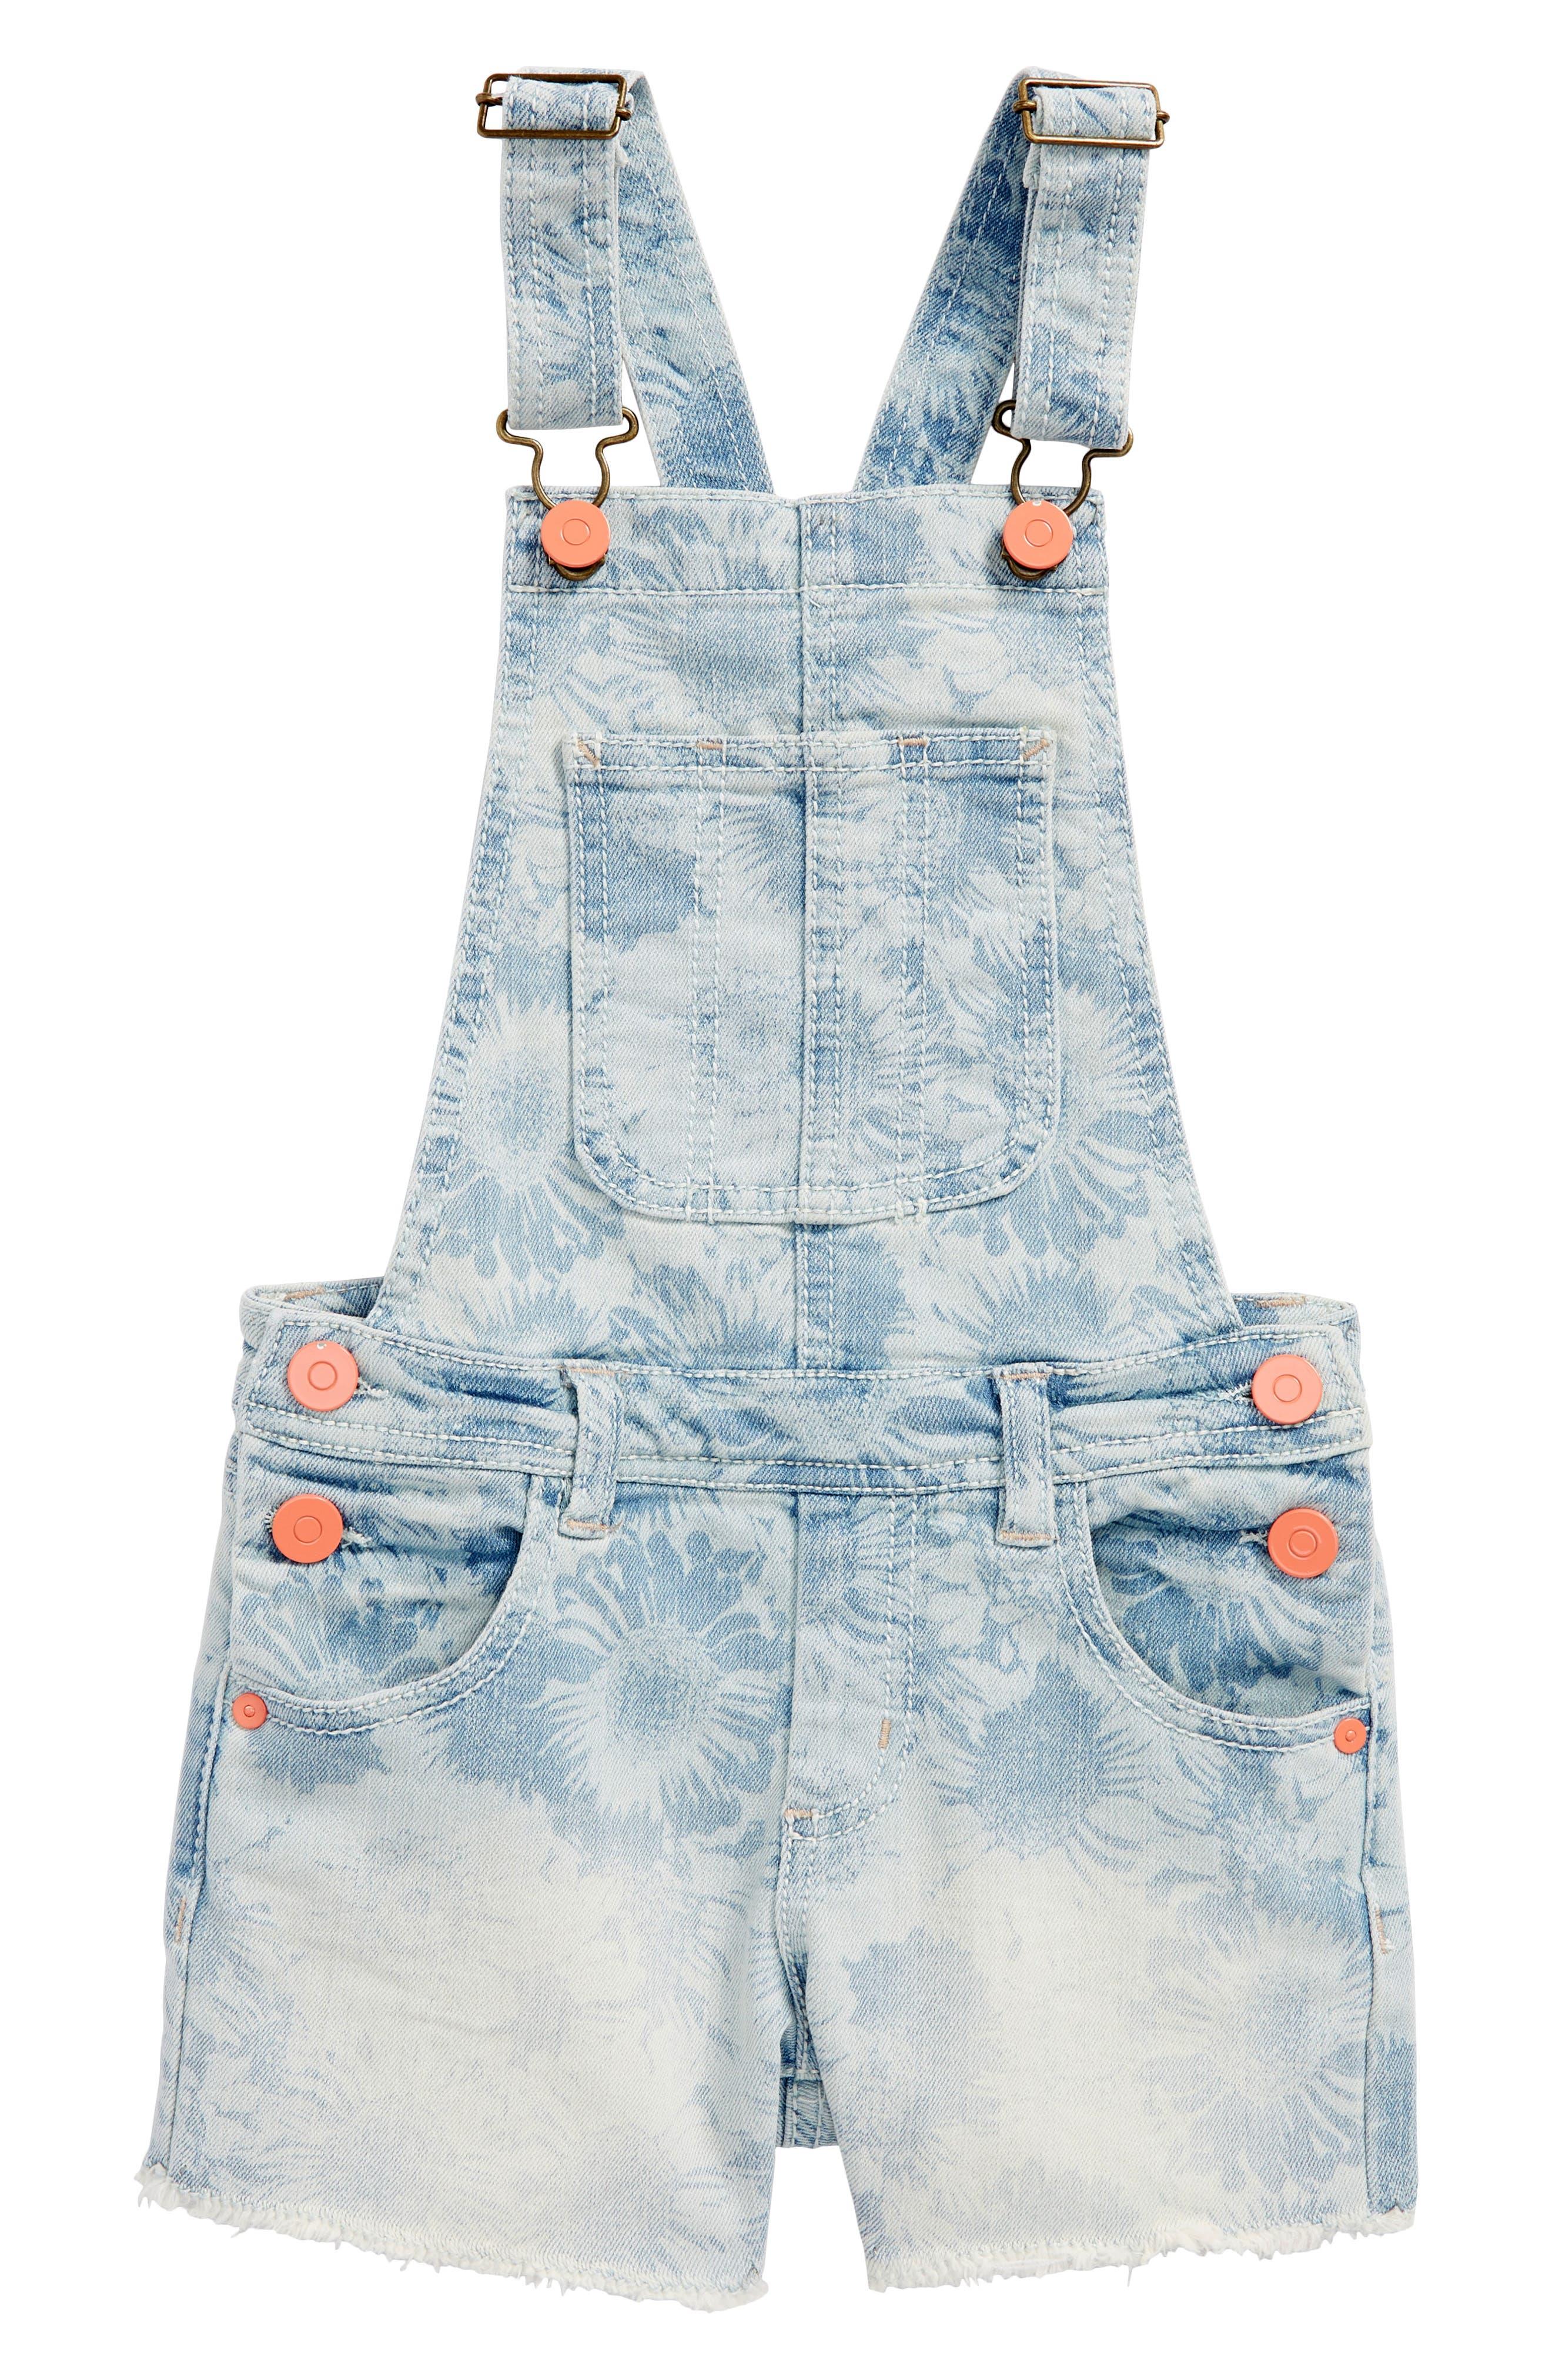 Daisy Cutoff Short Overalls,                         Main,                         color, 453